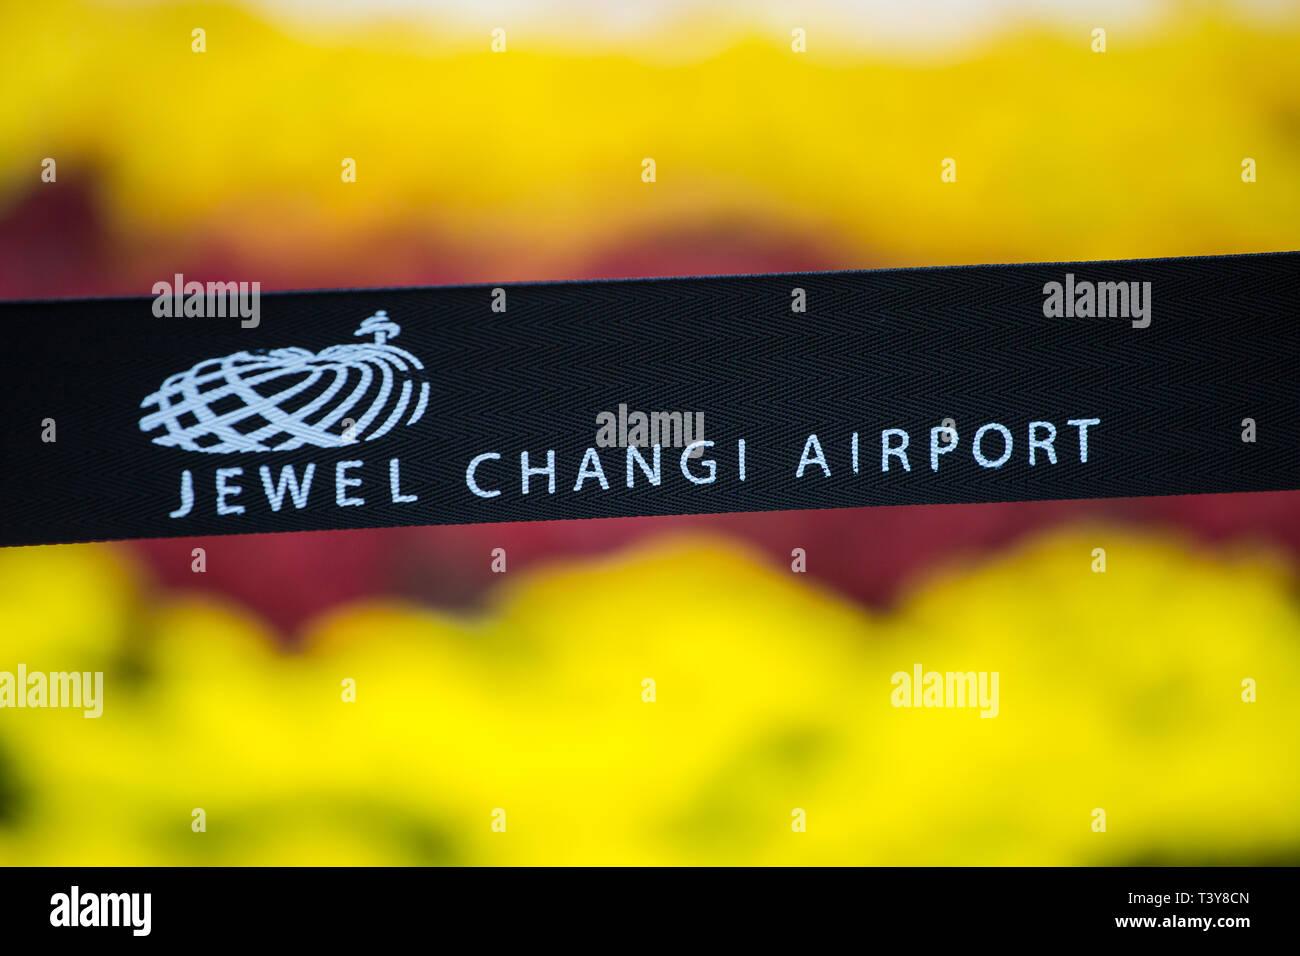 Jewel Changi Airport, Singapore - Stock Image